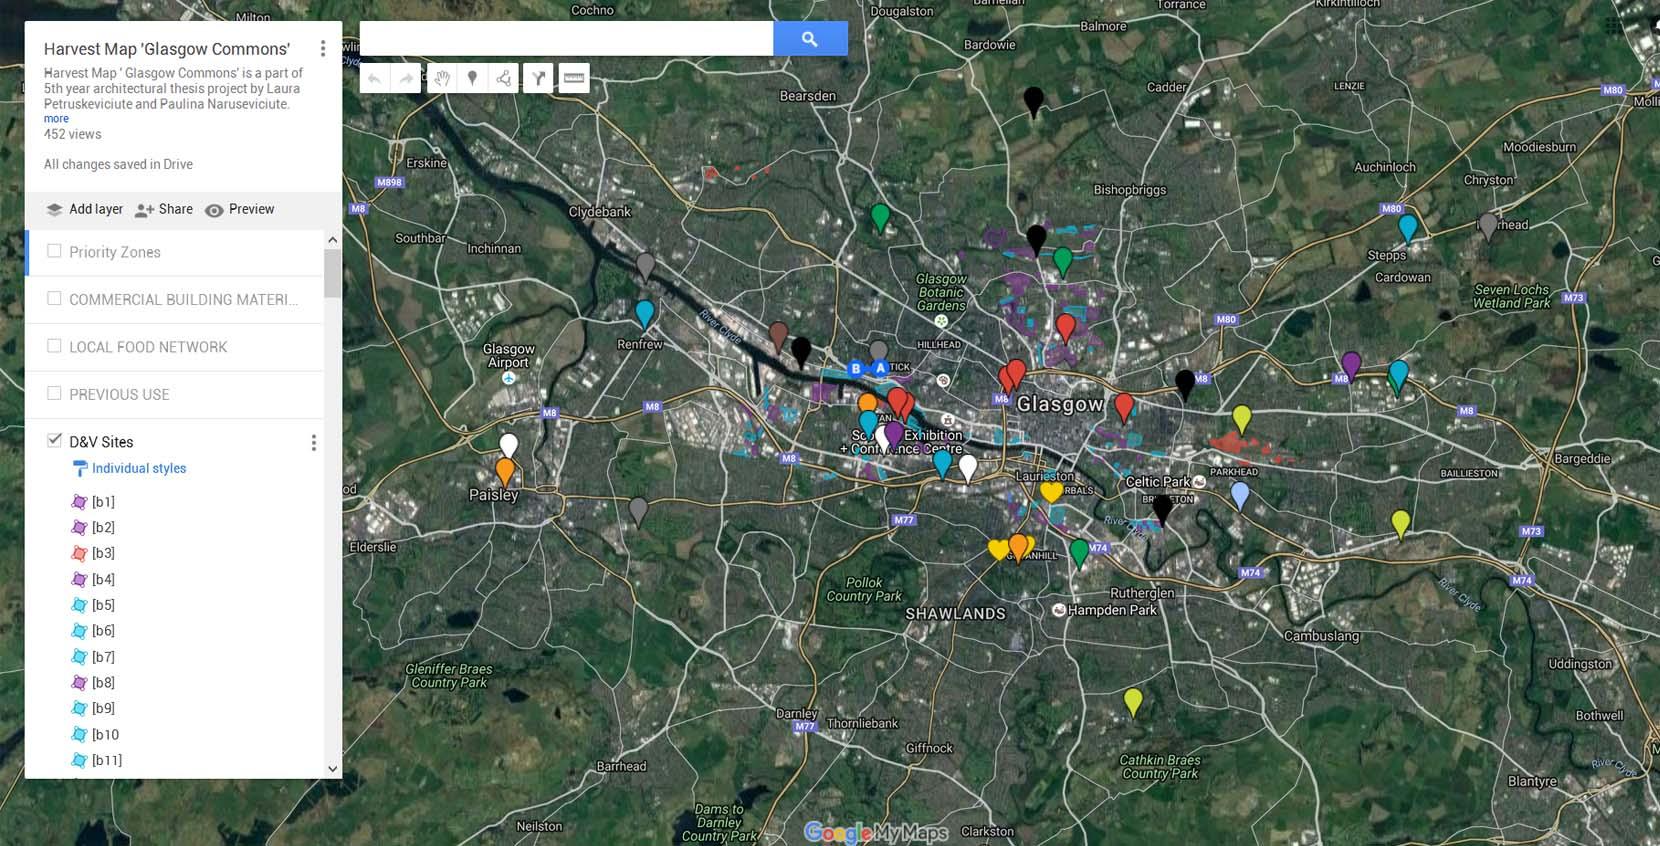 Harvest Map ' Glasgow Commons'